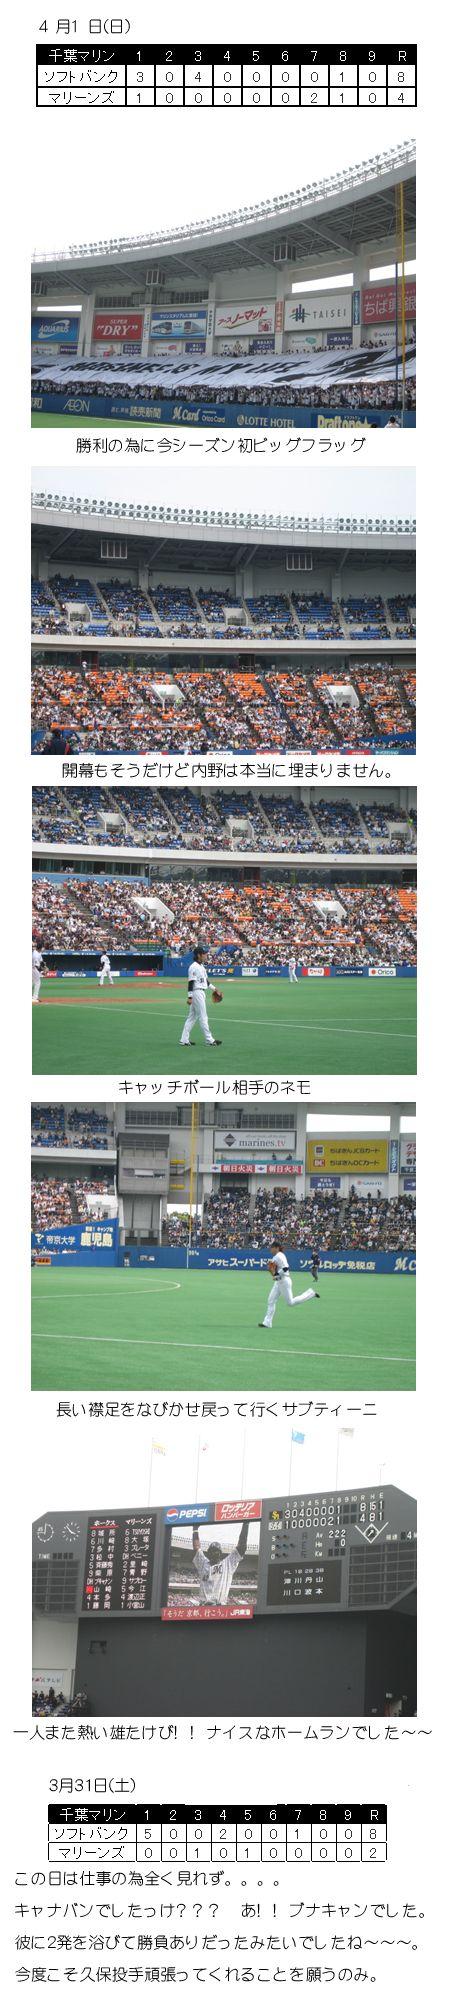 07-04-01-softbank.jpg